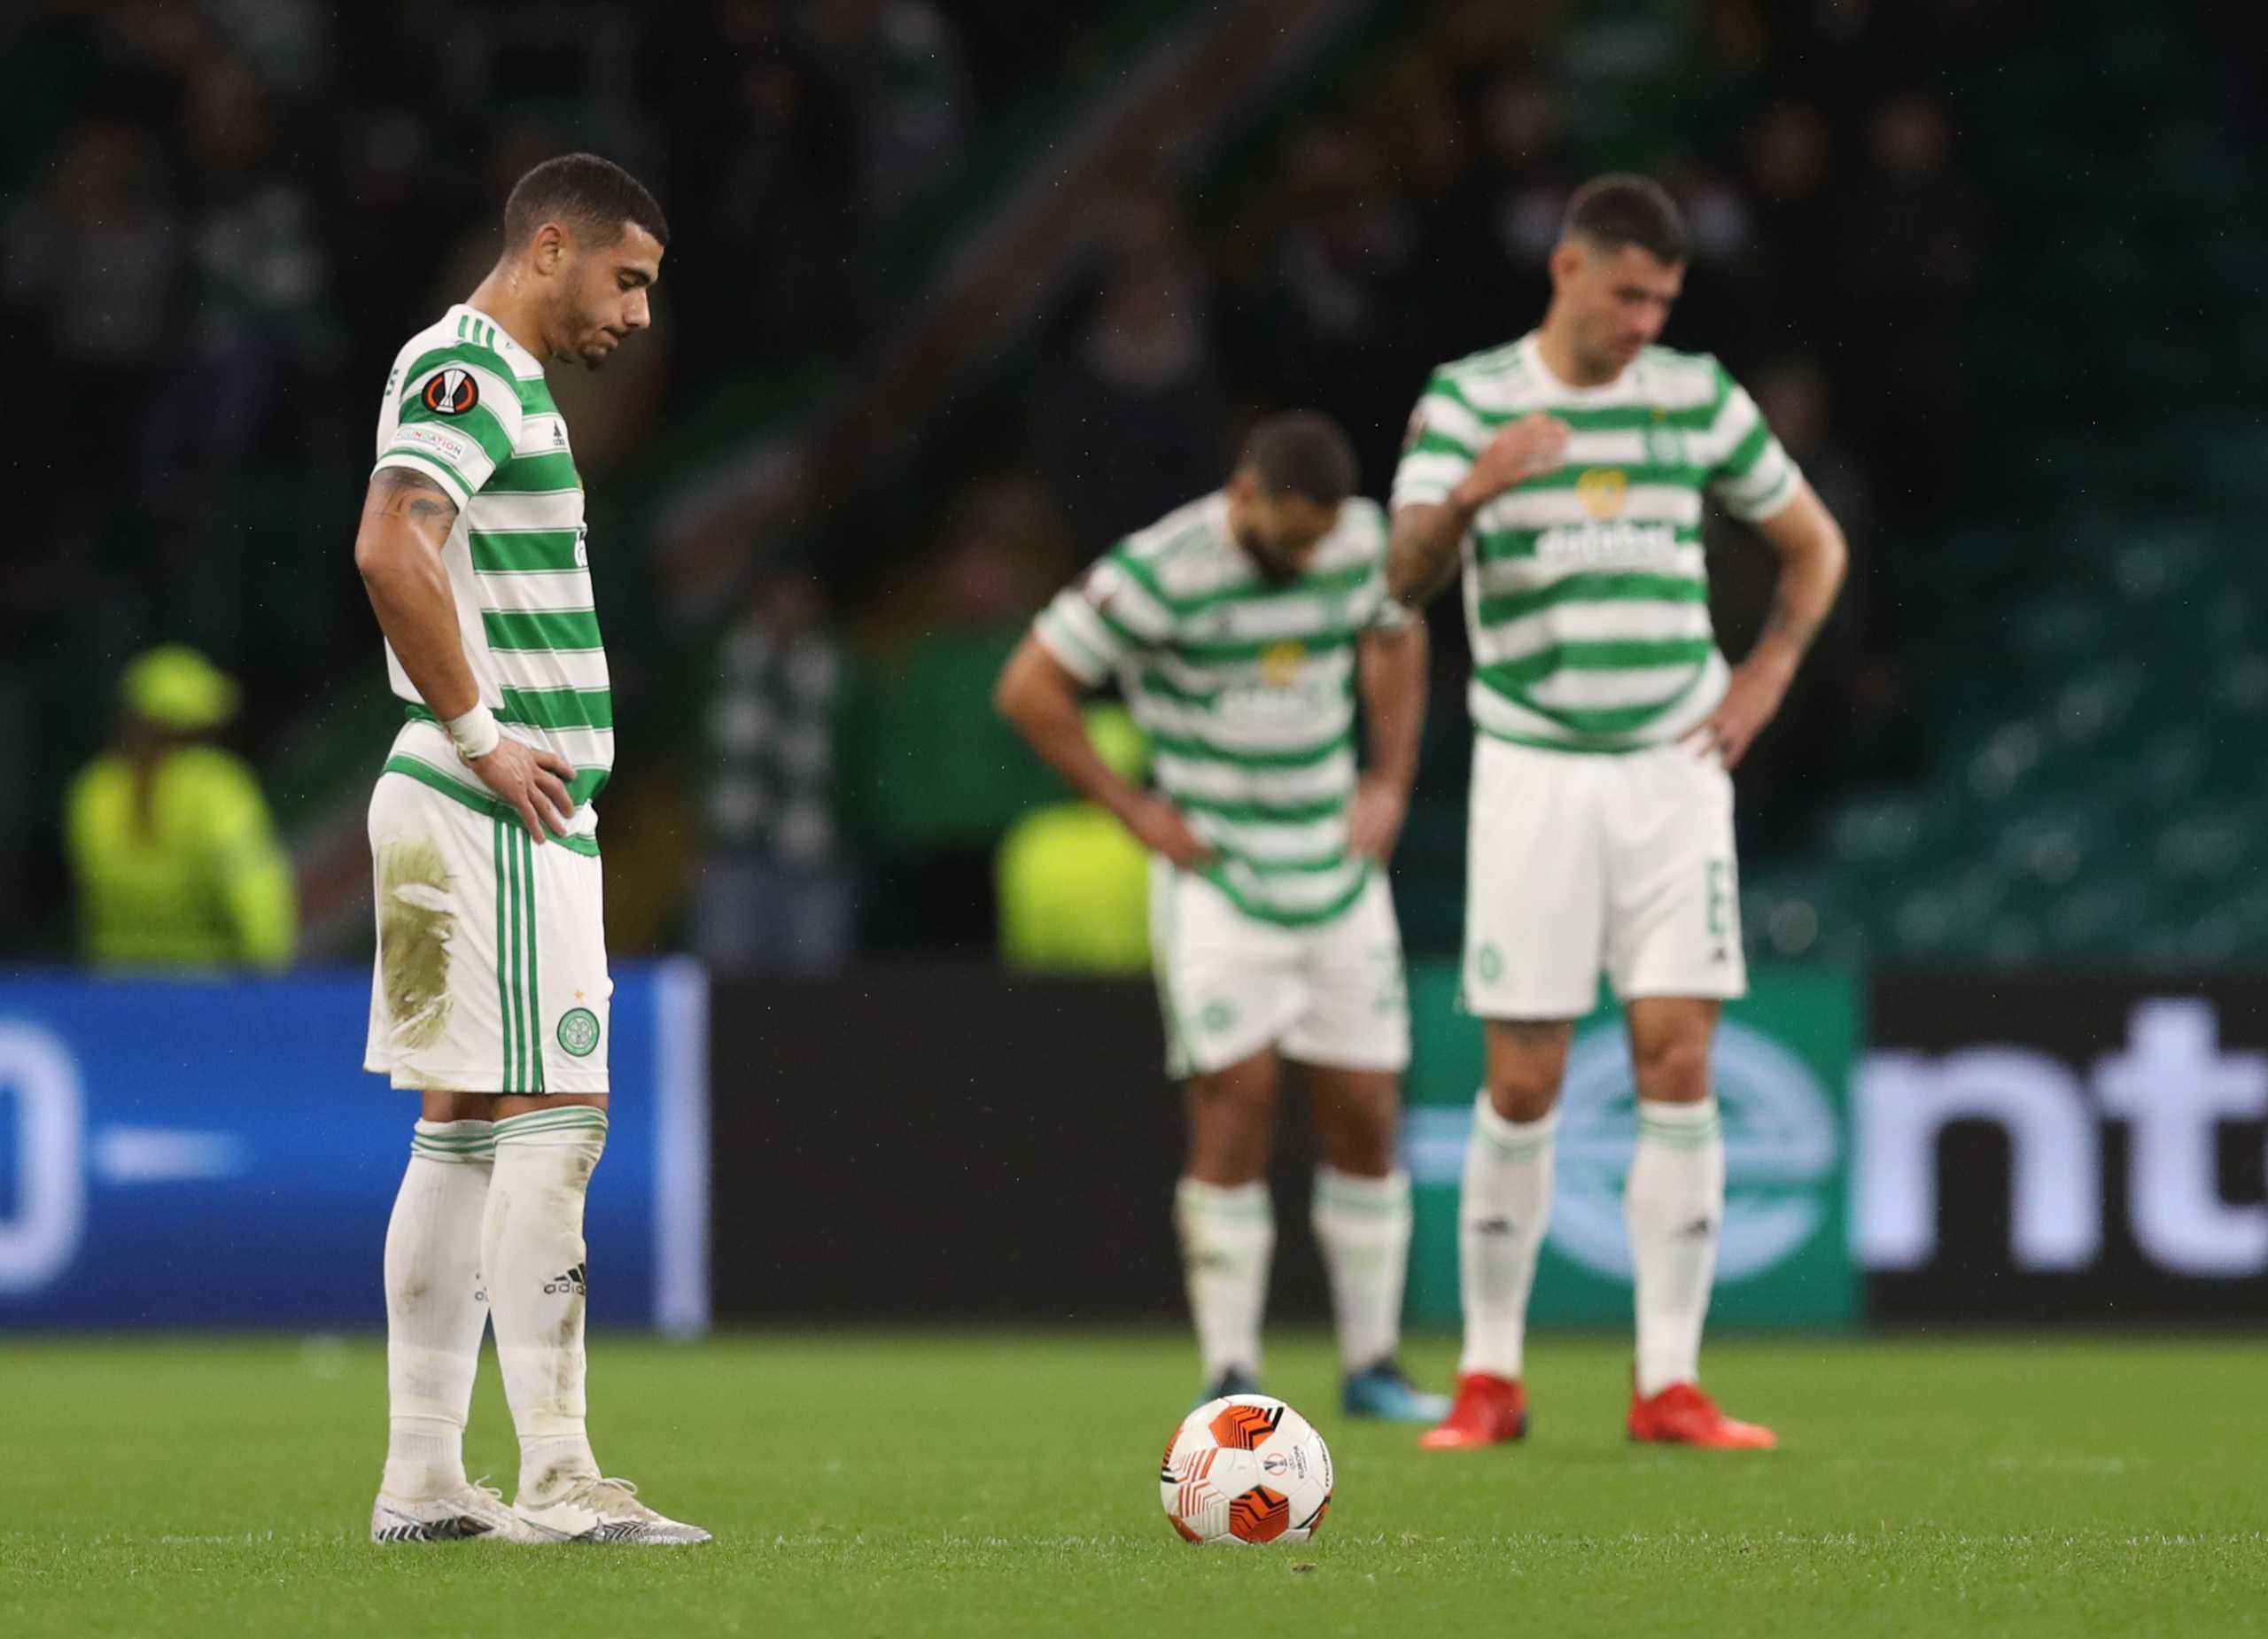 Europa League: Επίδειξη δύναμης η Λεβερκούζεν με Σέλτικ – Τα αποτελέσματα της δεύτερης αγωνιστικής